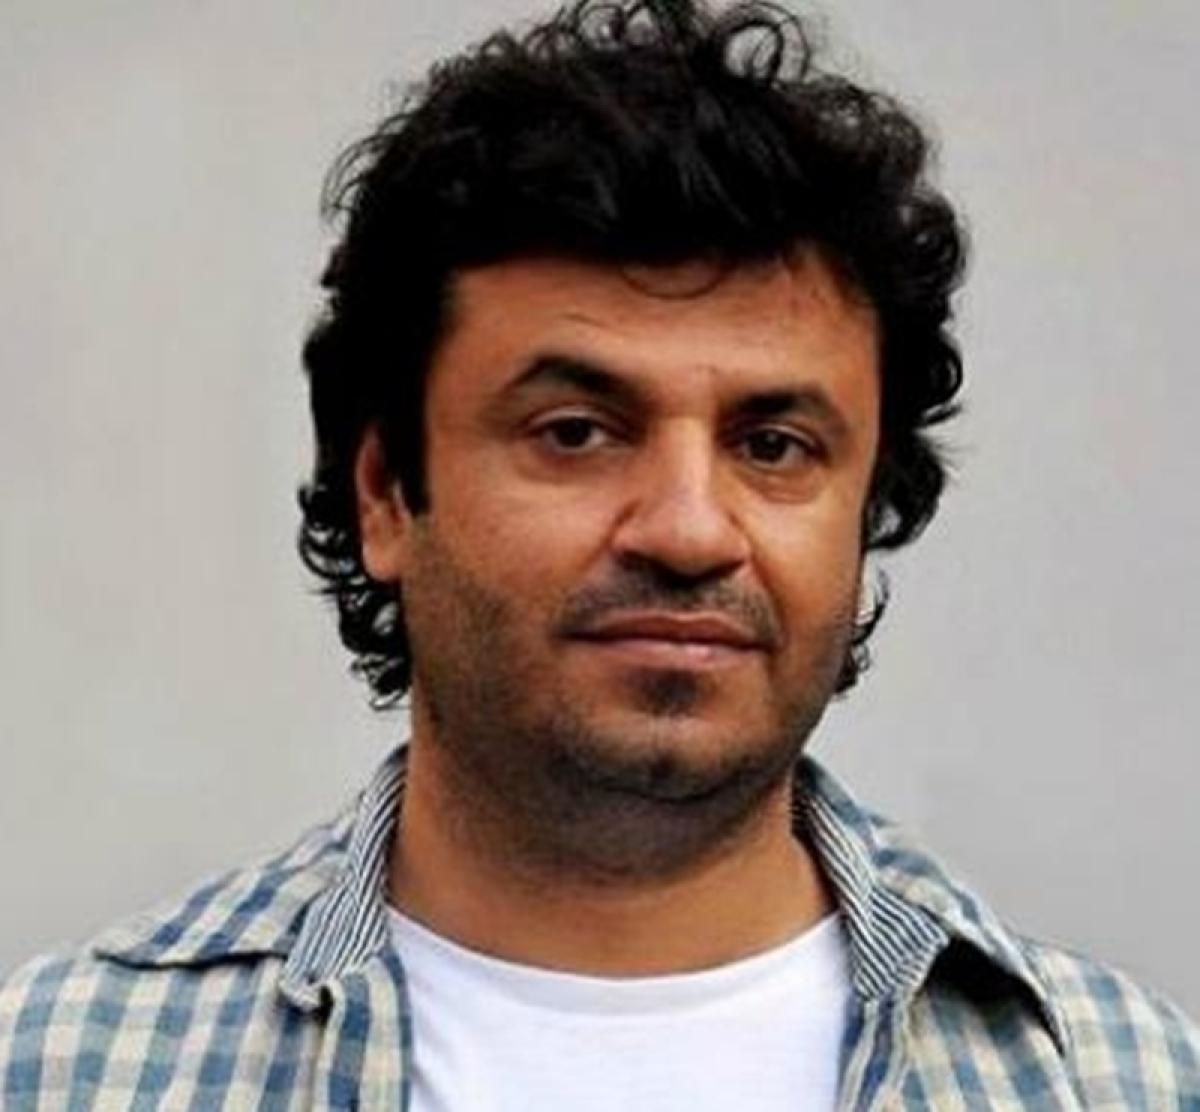 #MeToo: Vikas Bahl moves High Court with defamation suit against Anurag Kashyap and Vikramaditya Motwane